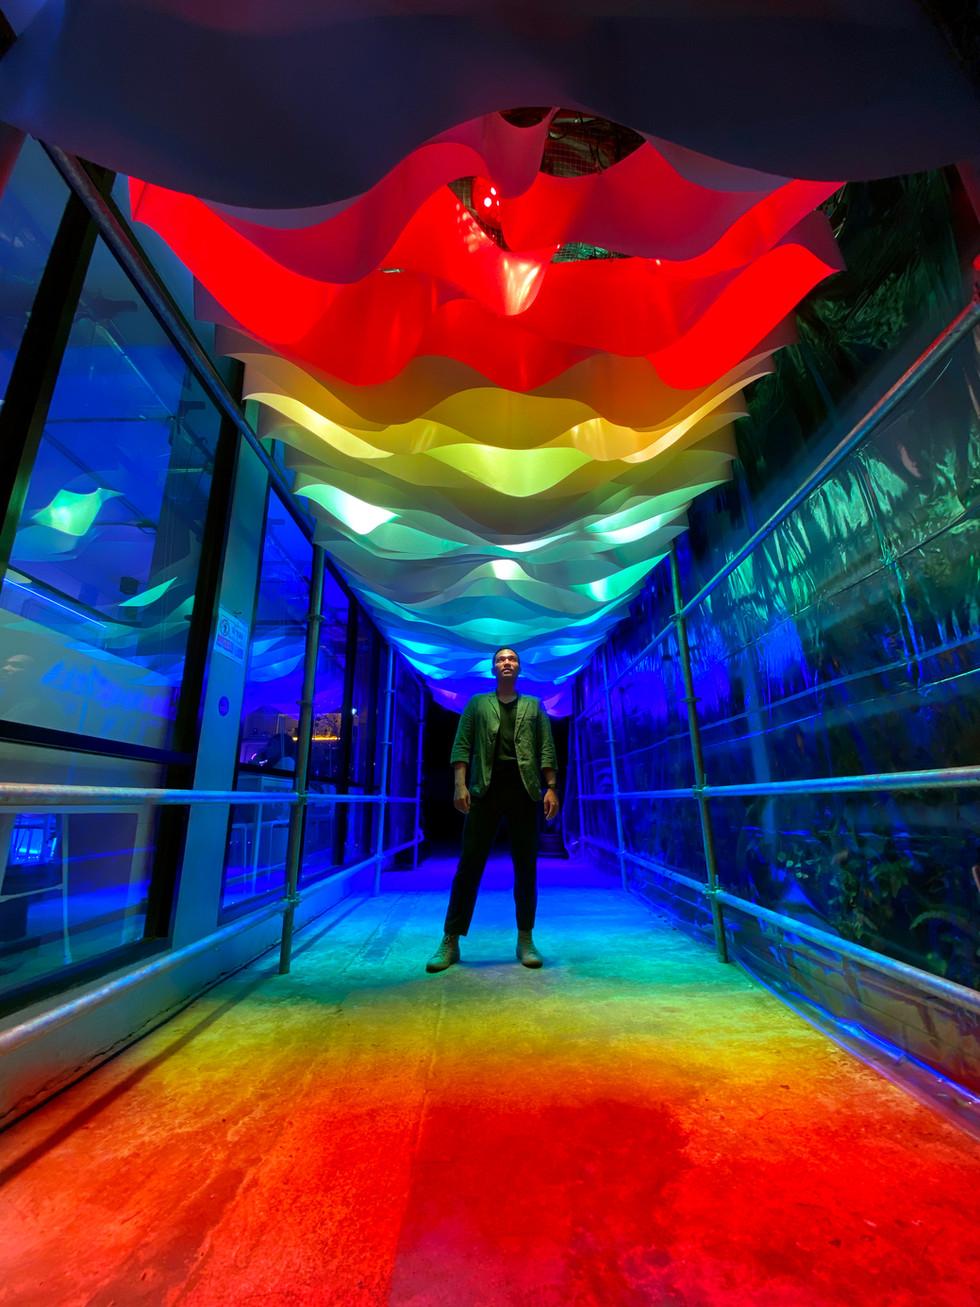 red, orange, yellow, green, blue, indigo and violet